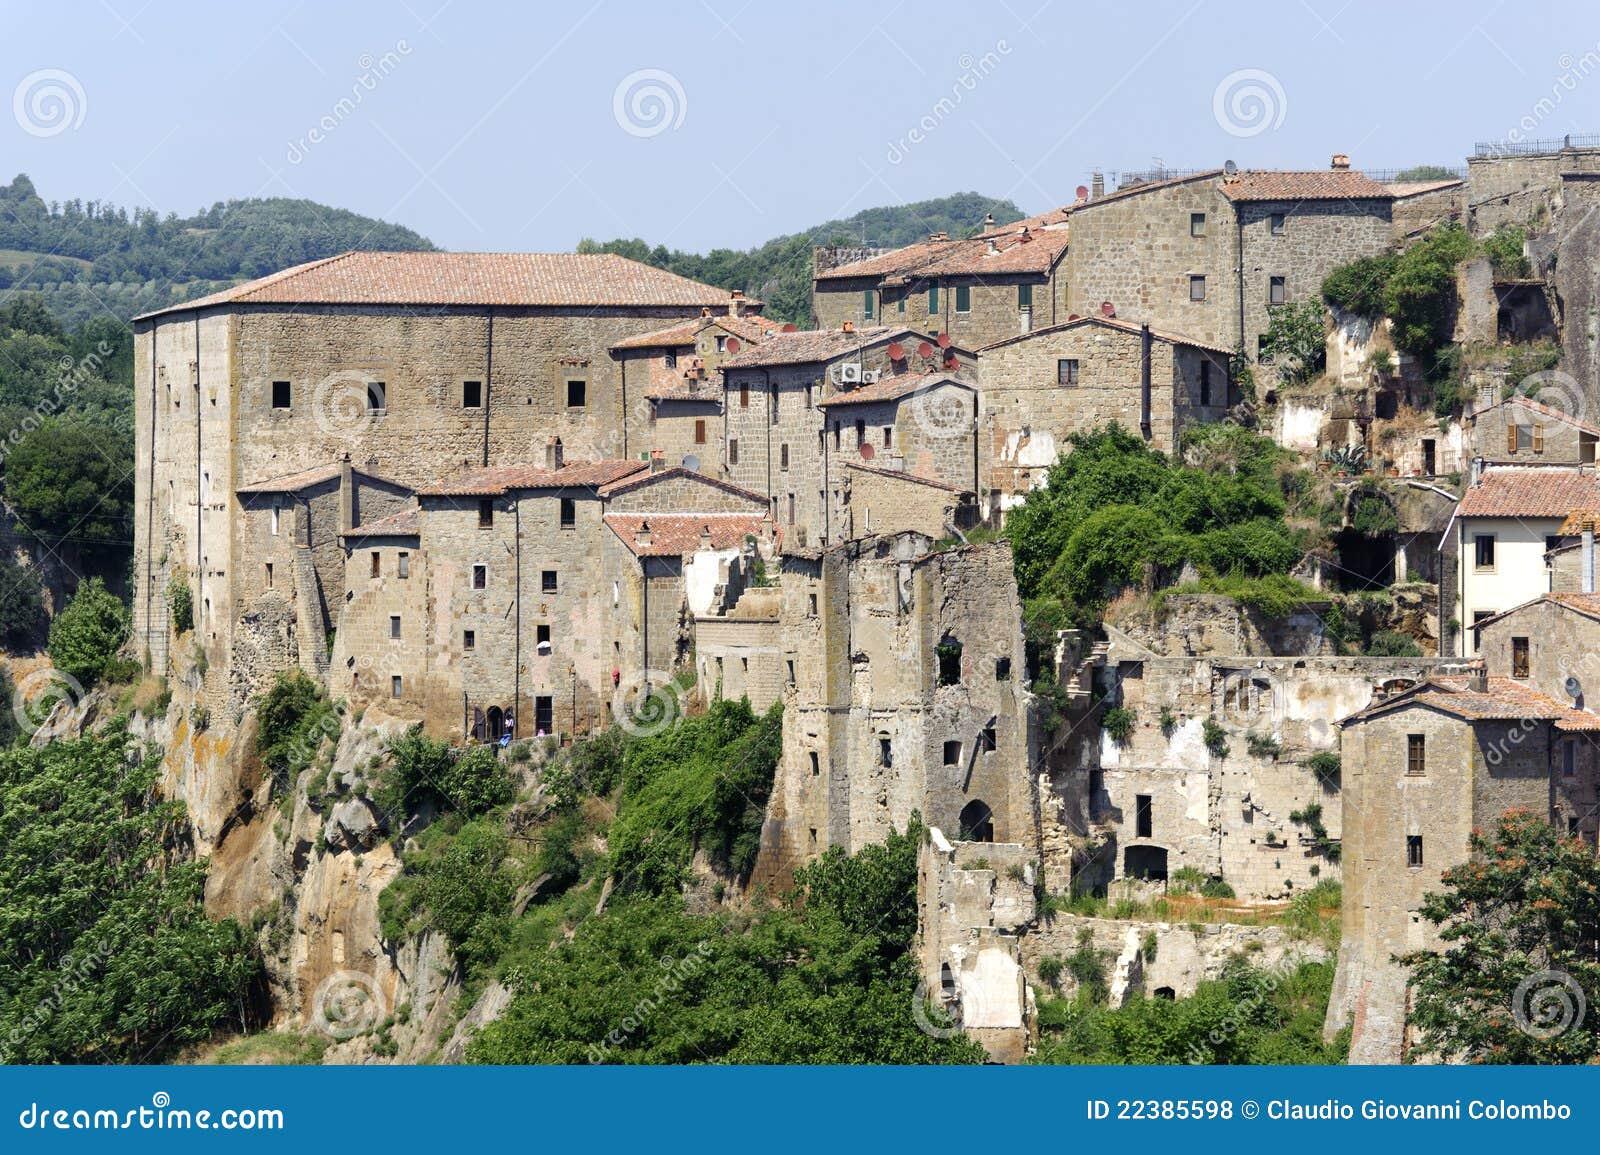 Sorano Italy  city photos gallery : Sorano Grosseto, Tuscany, Italy , panoramic view of the medieval town ...